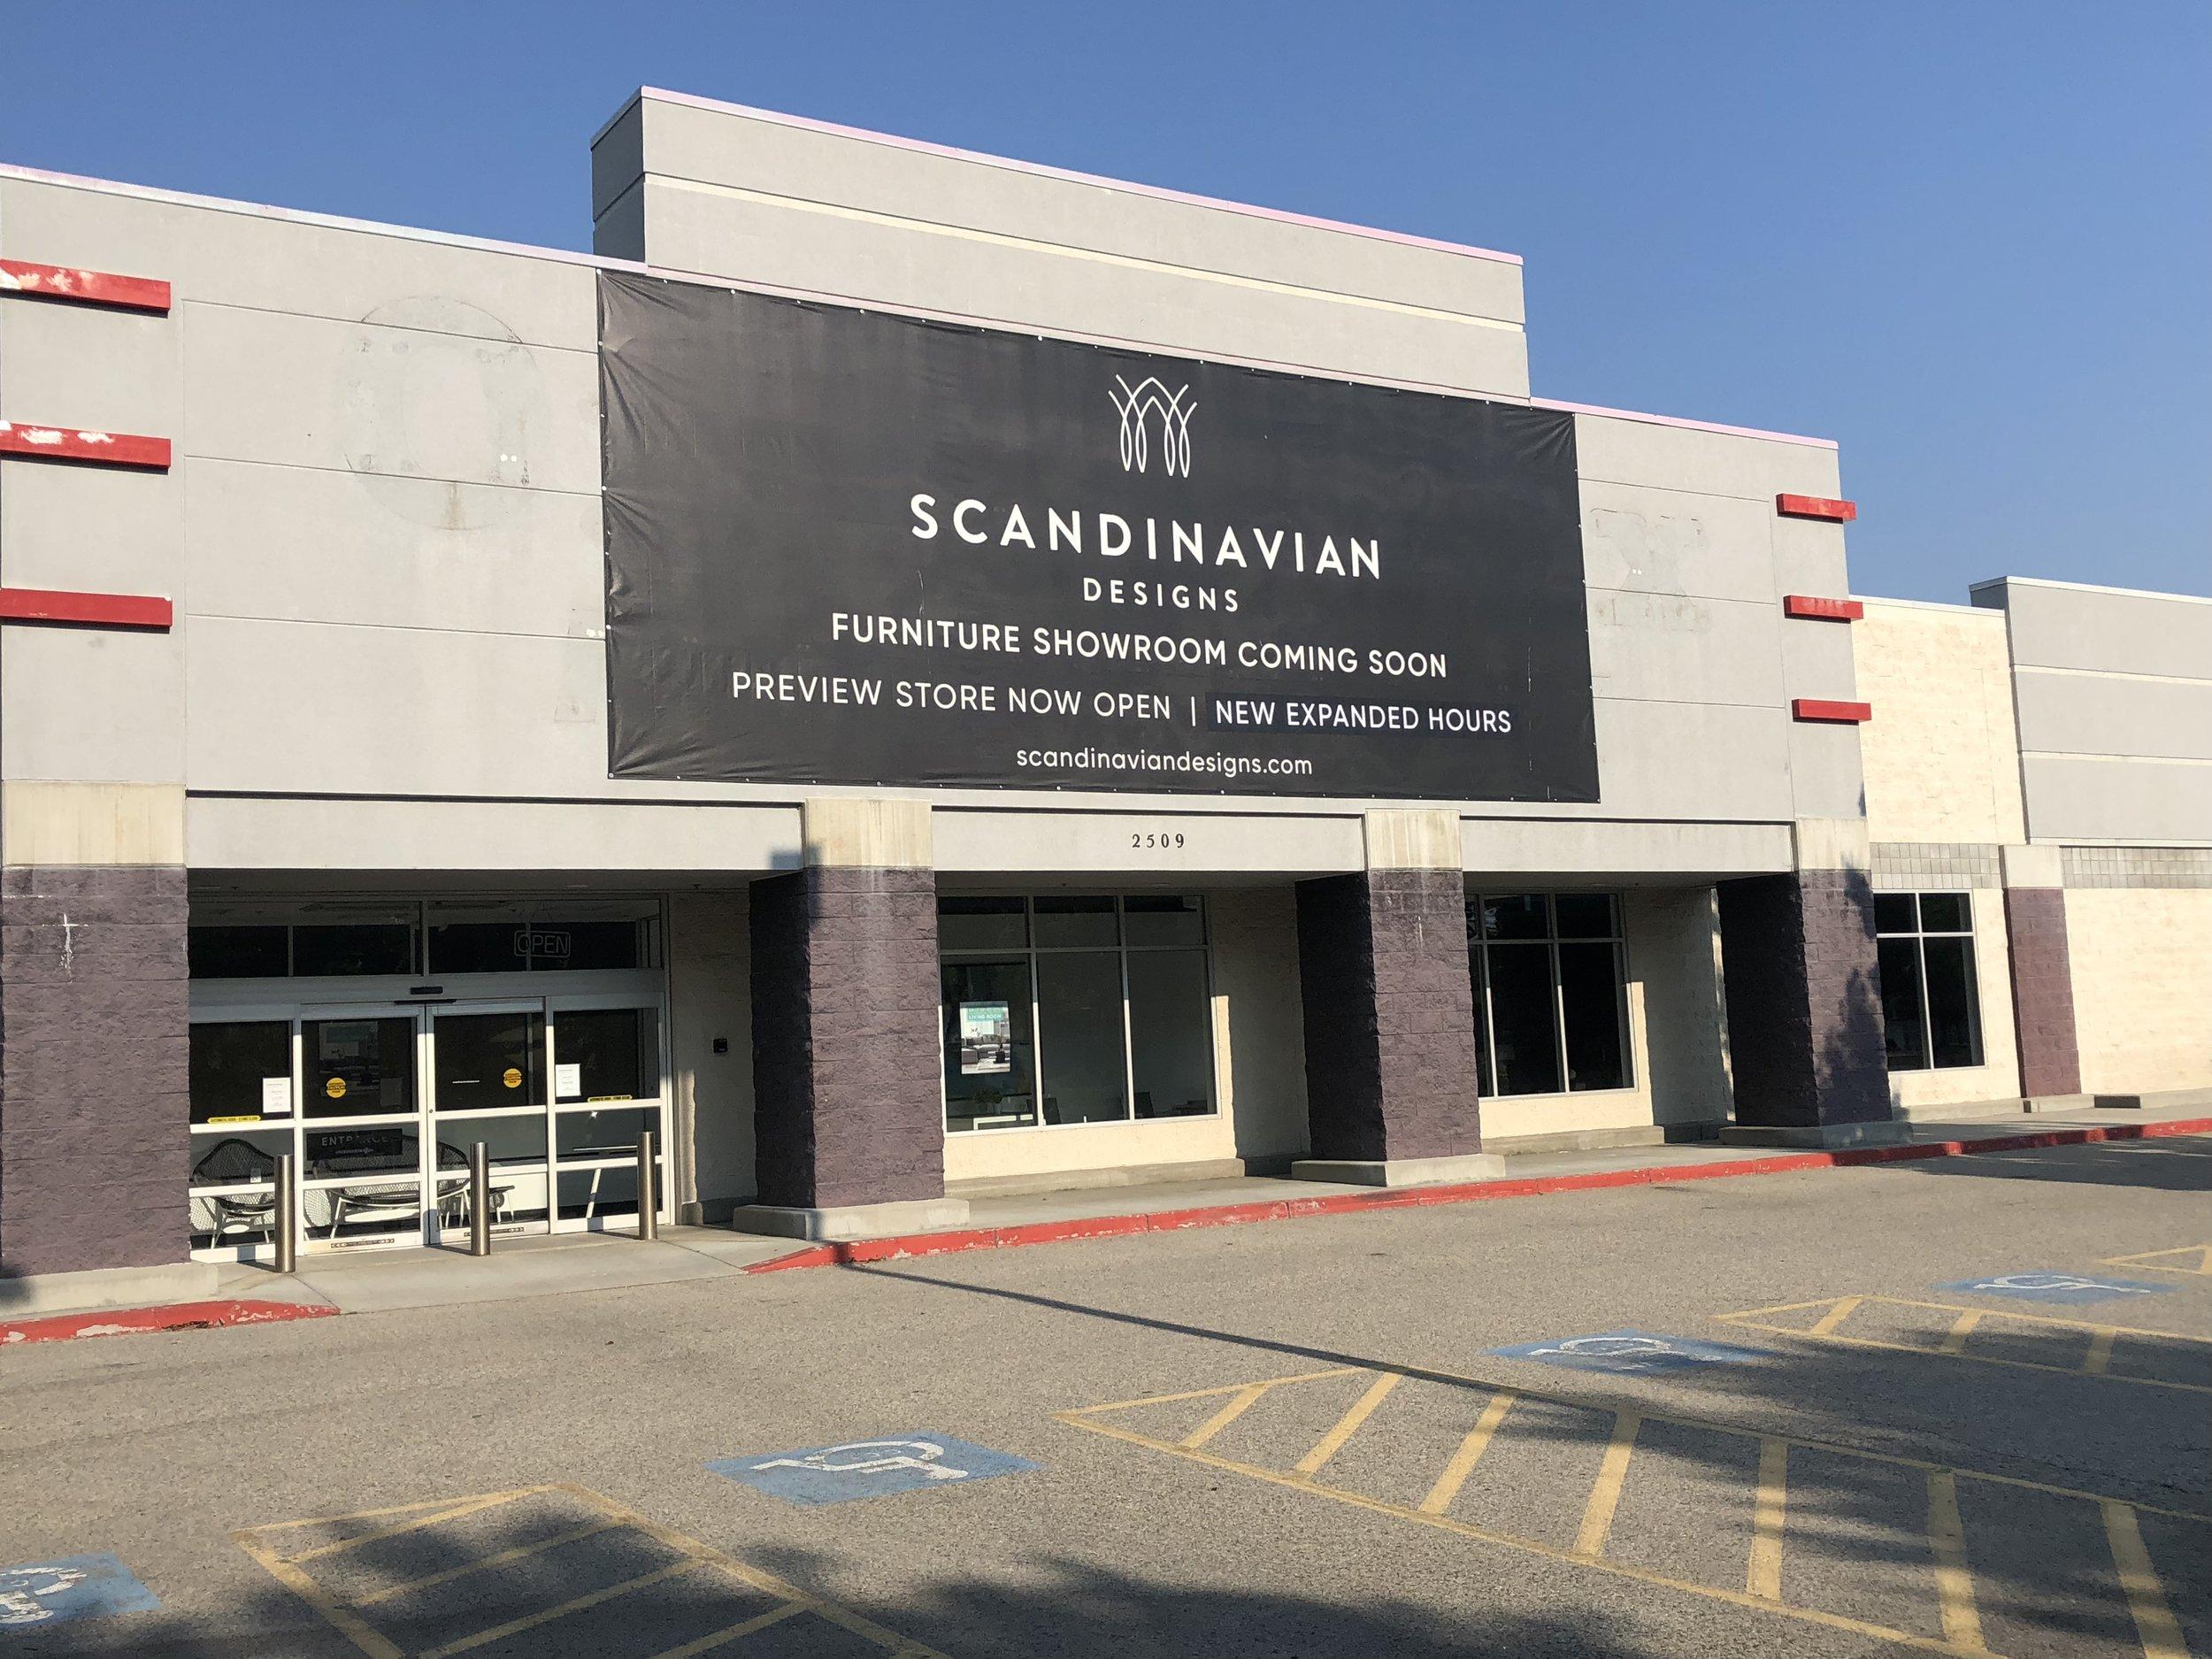 Scandinavian Designs Plans Furniture Store In Old